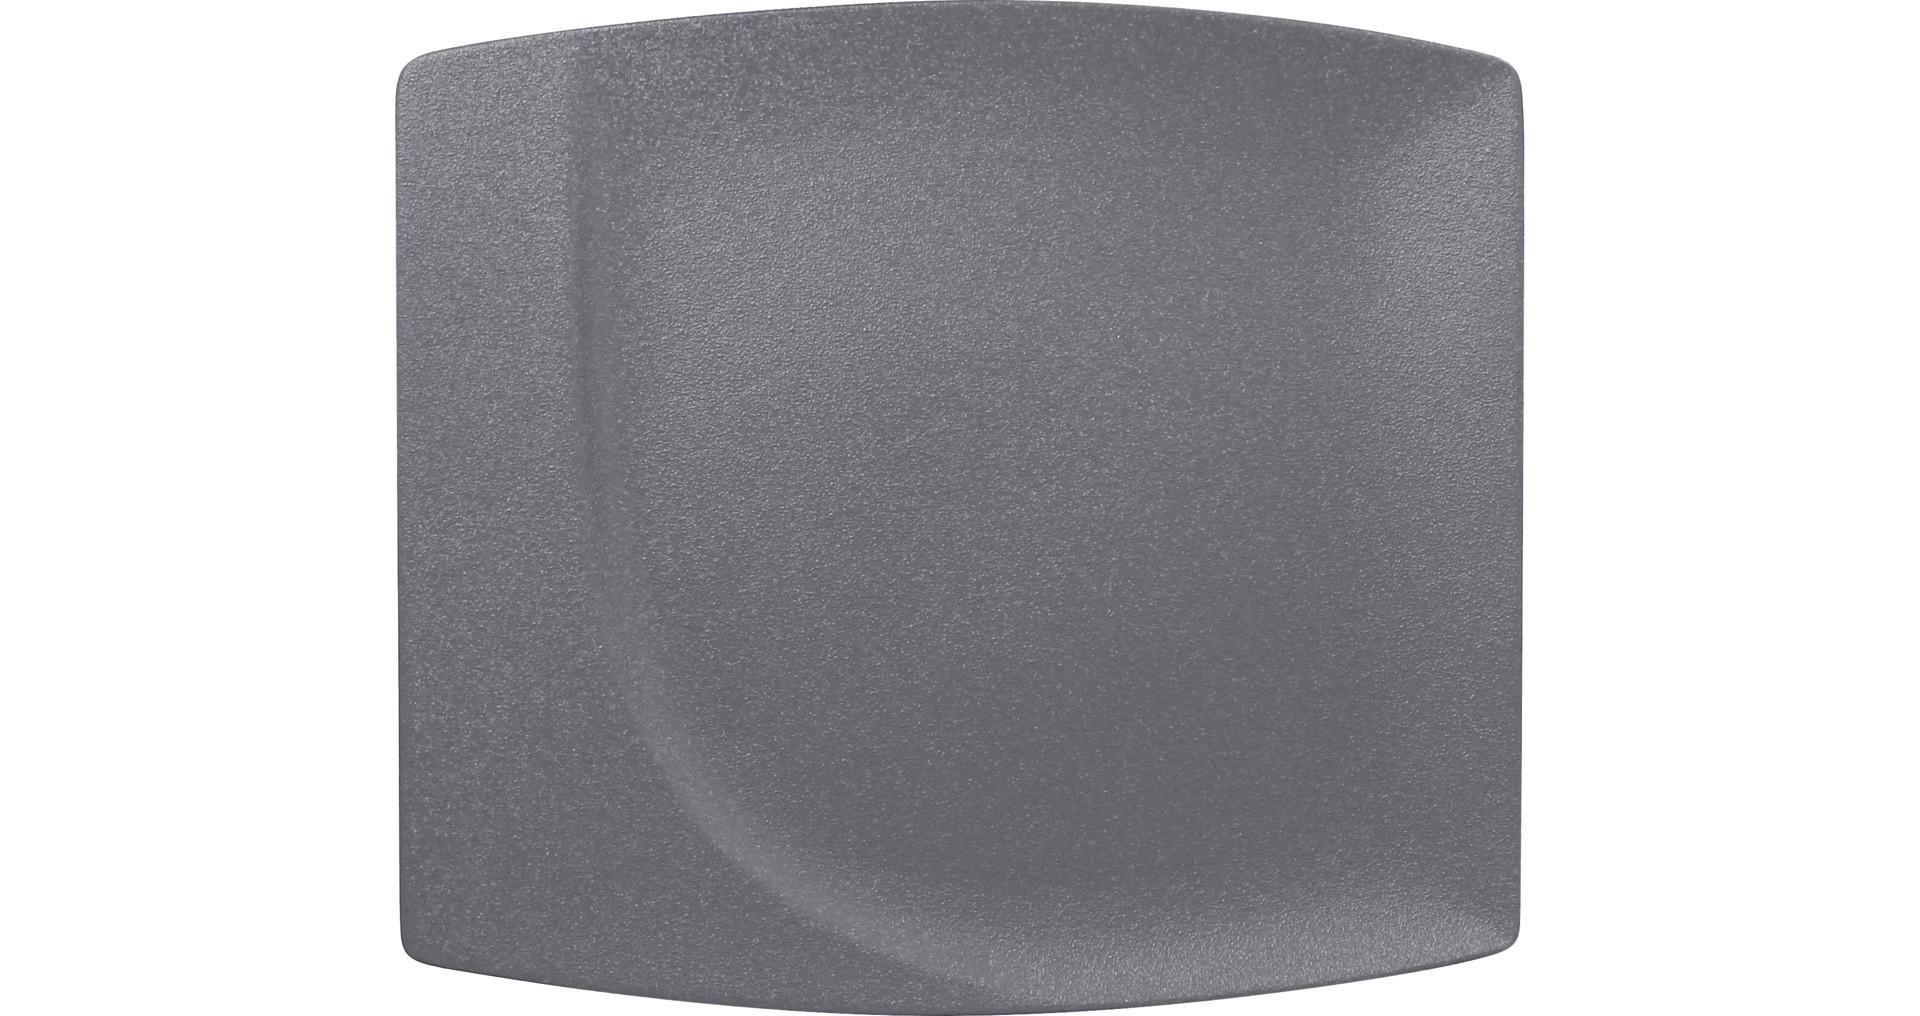 Neofusion, Teller flach quadratisch 320 x 290 mm stone